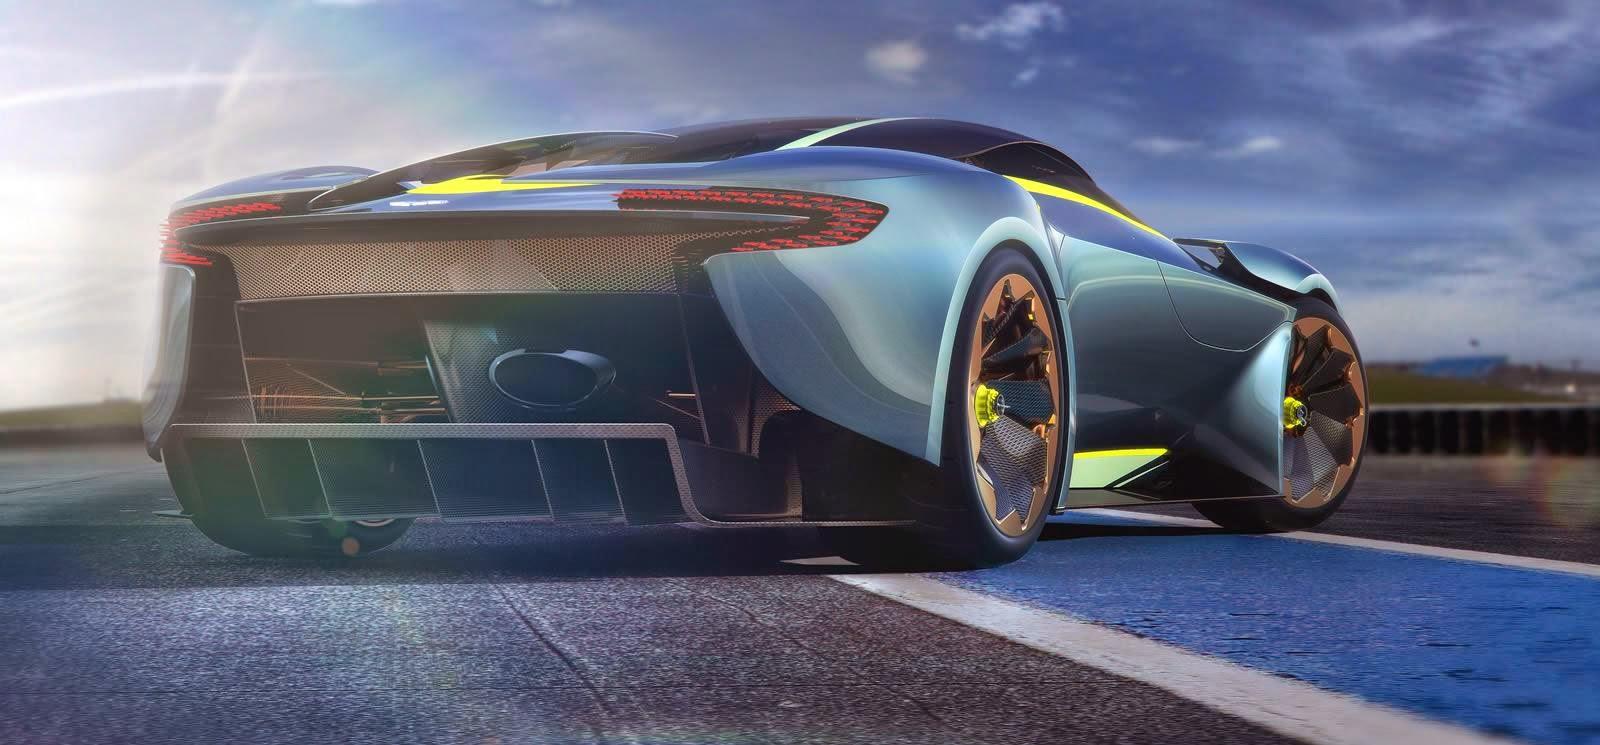 [Resim: Aston+Martin+DP-100+Vision+Gran+Turismo+2.jpg]